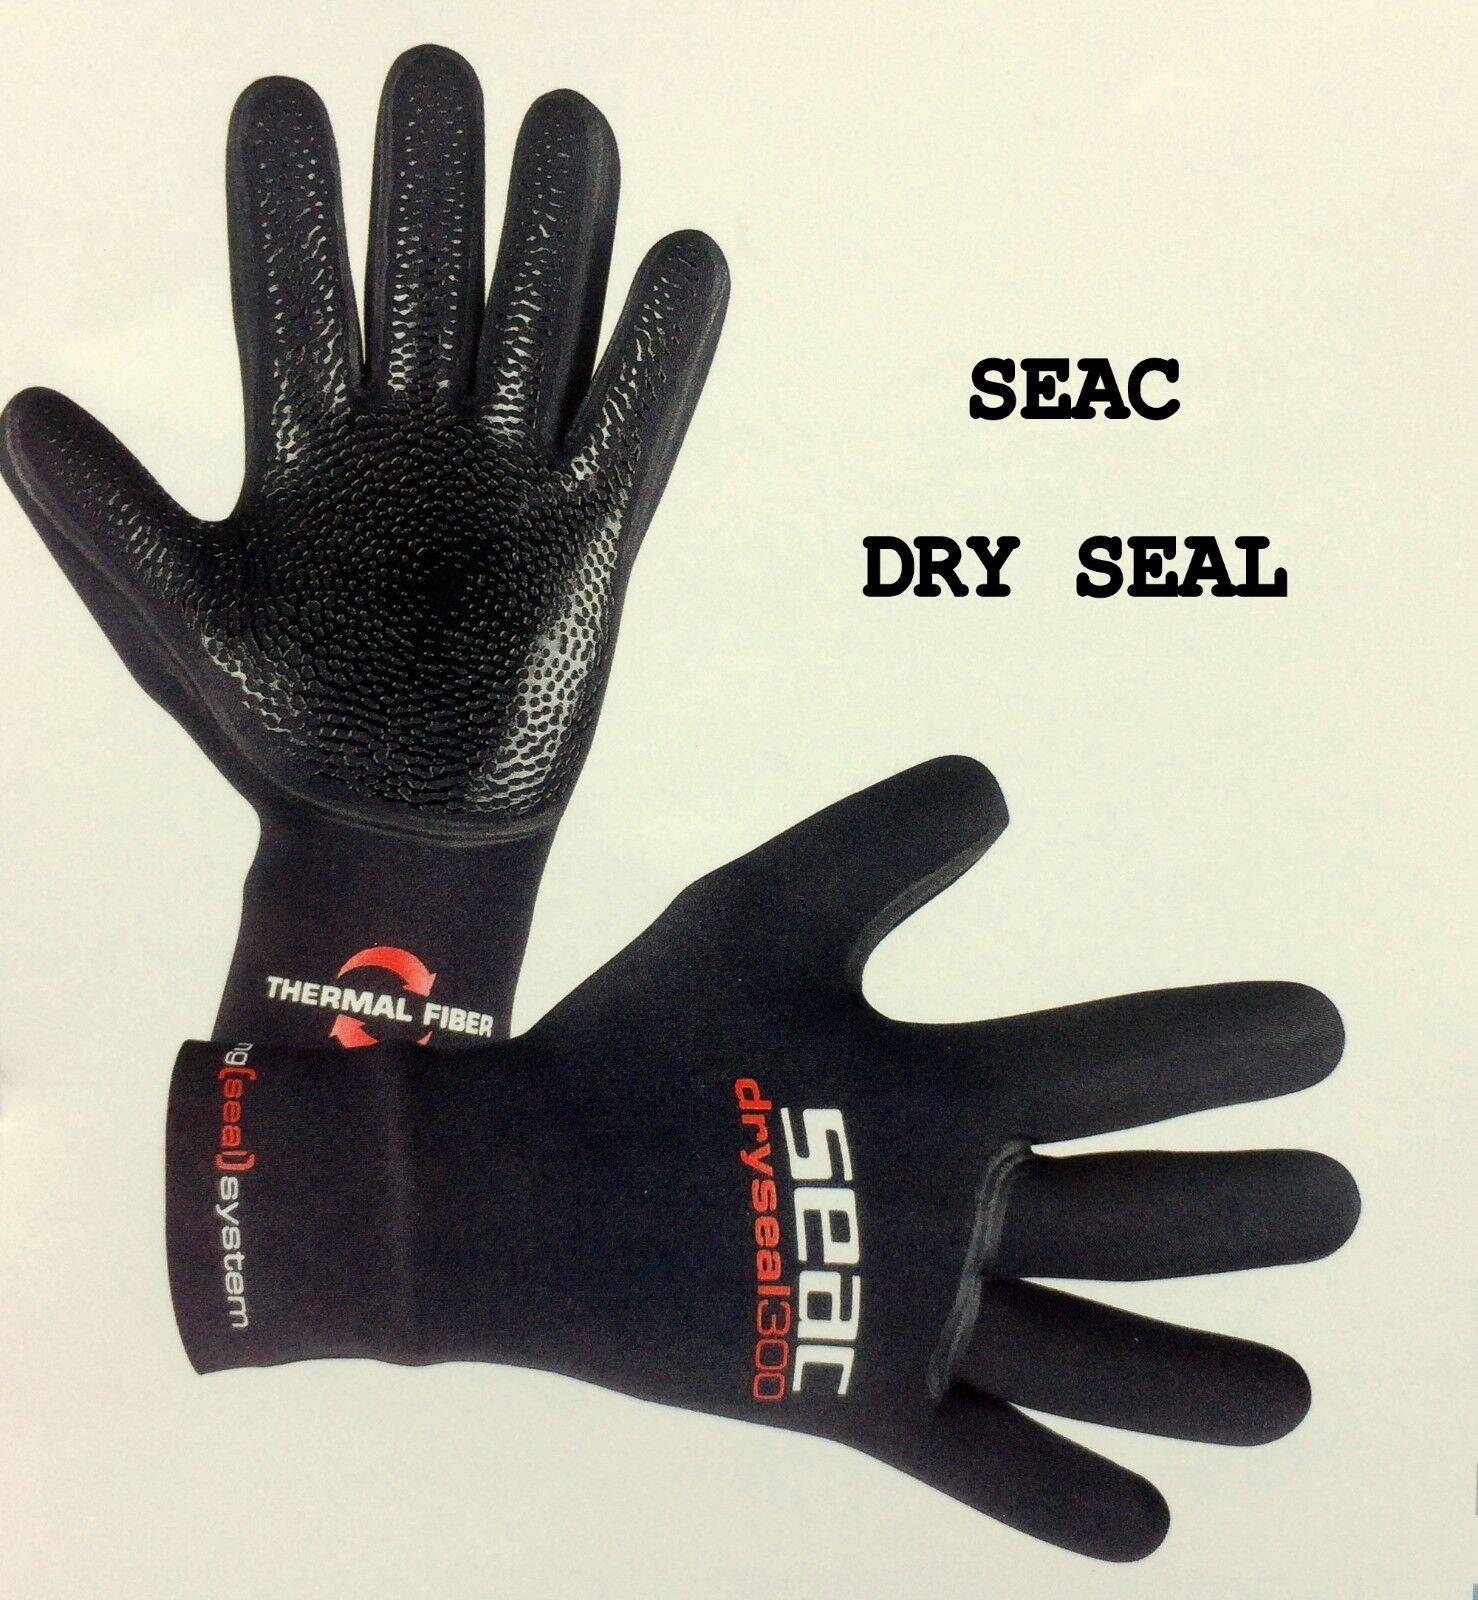 Neopren Handschuhe Paar  DRYSEAL500  5 mm L SEACSUB  | Elegant